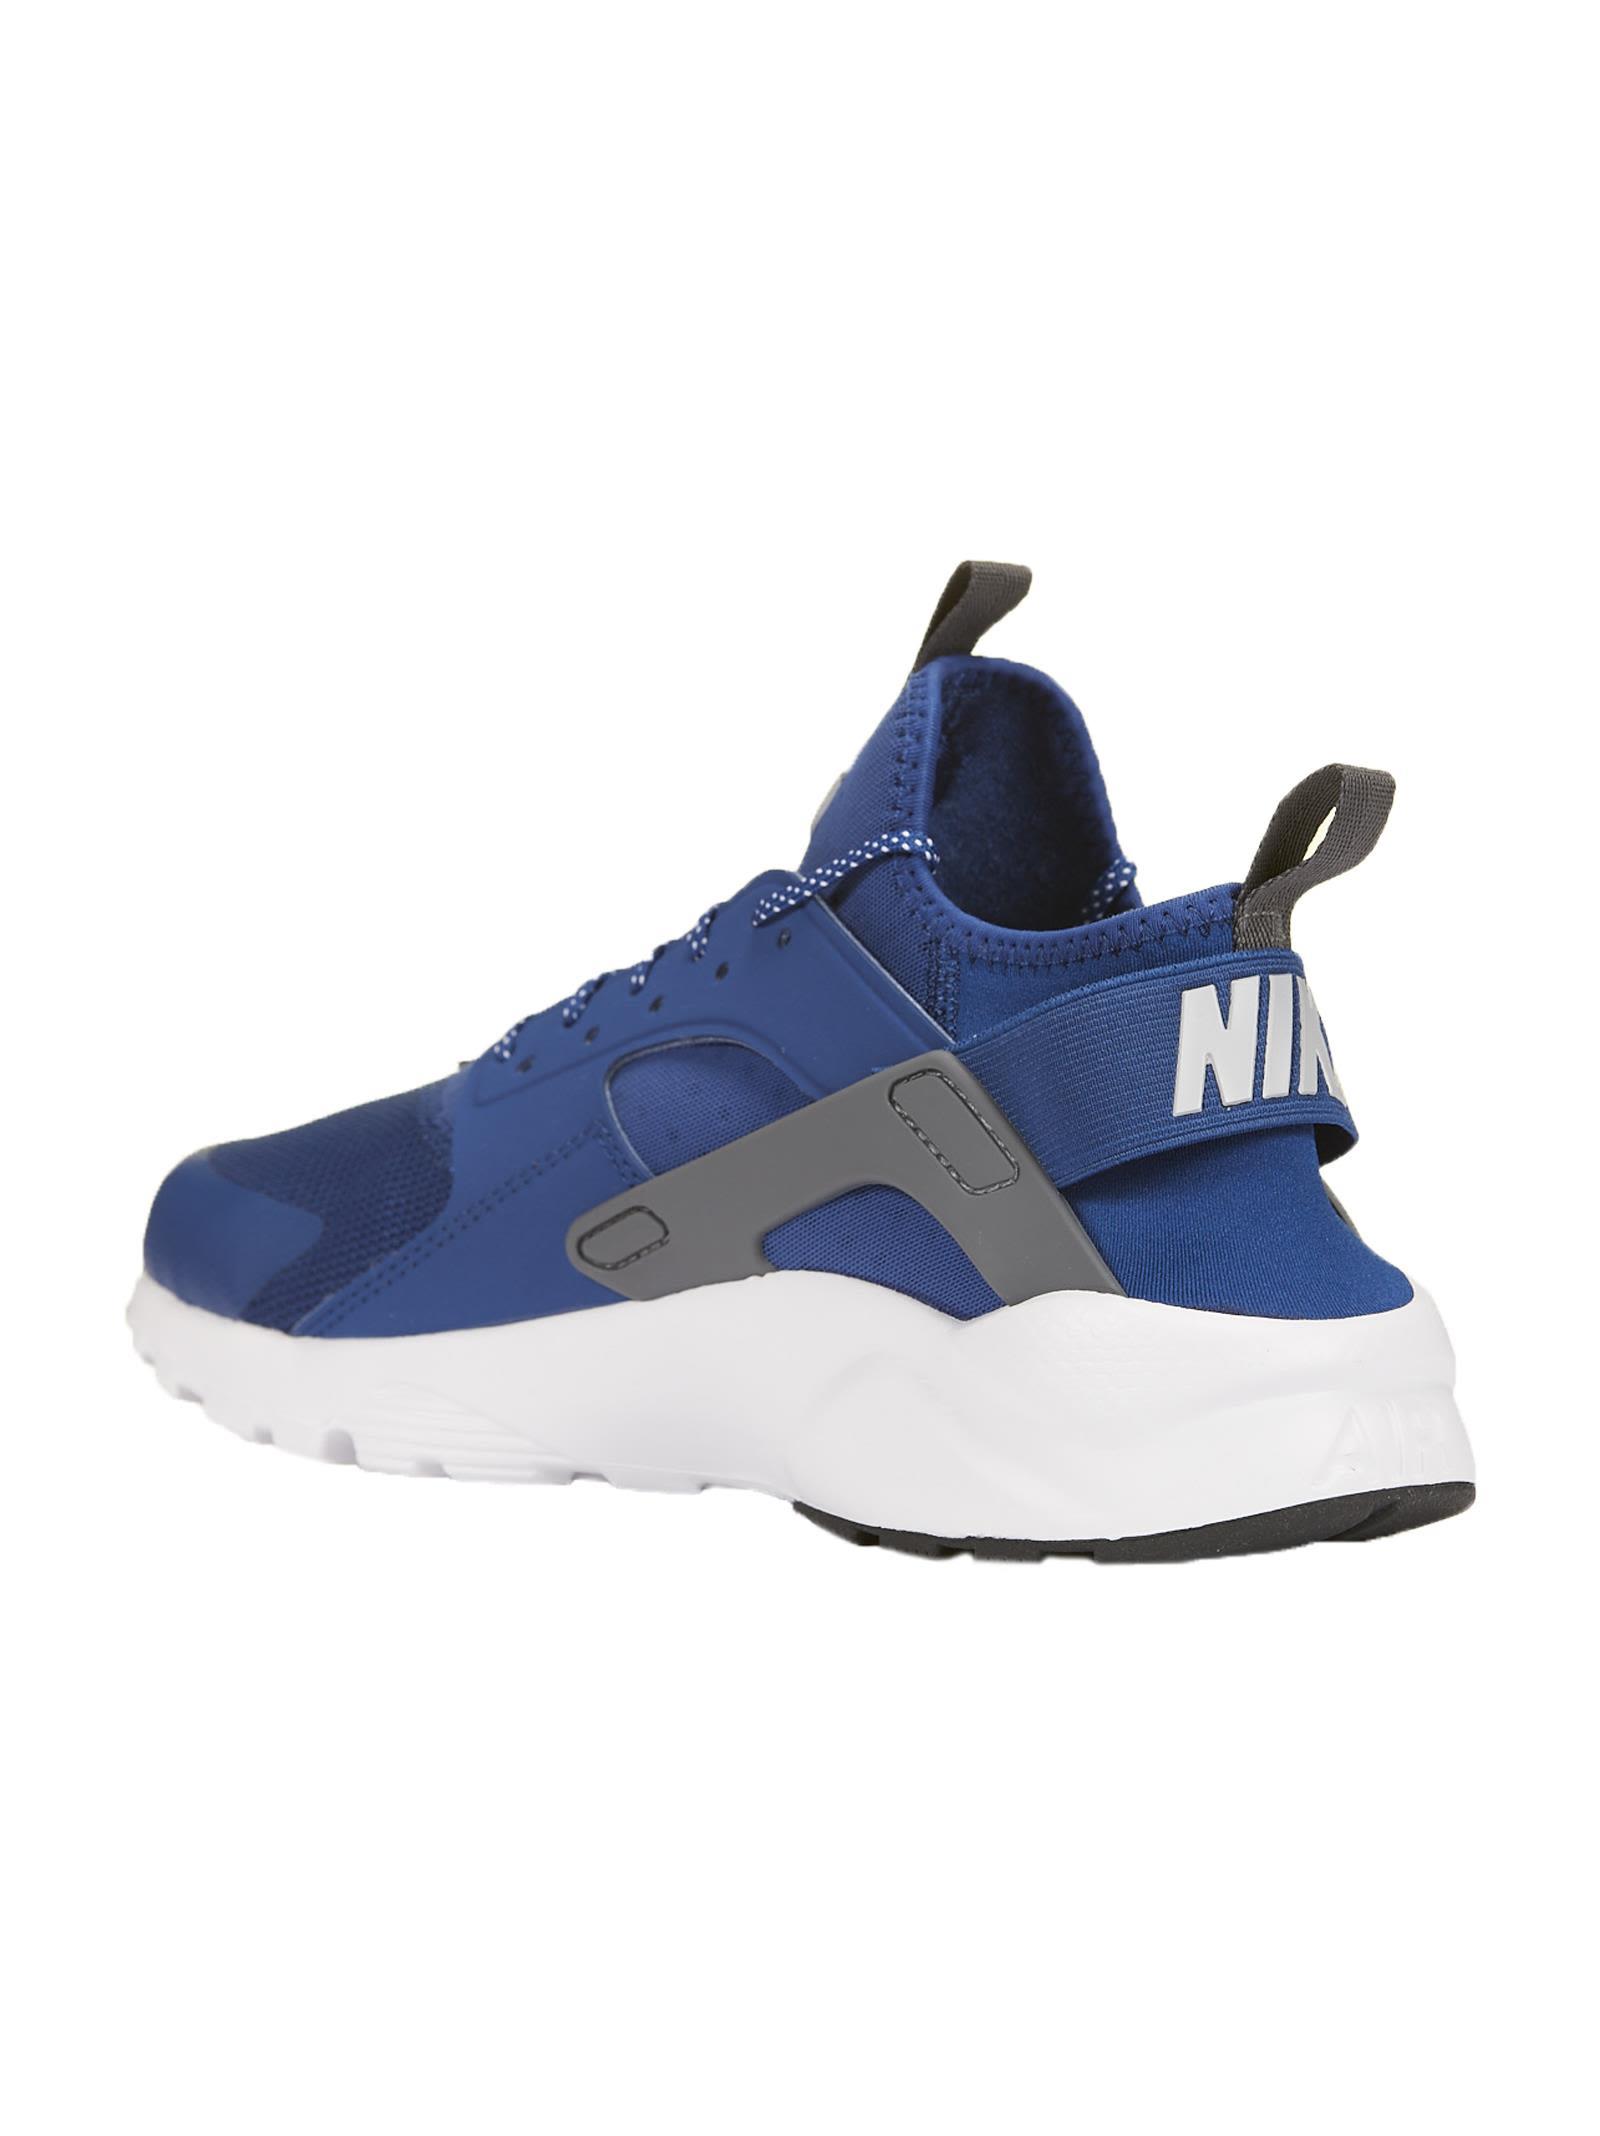 low priced bea1e 1d9a3 ... Nike Air Huarache Run Ultra Sneakers - Blu bianco